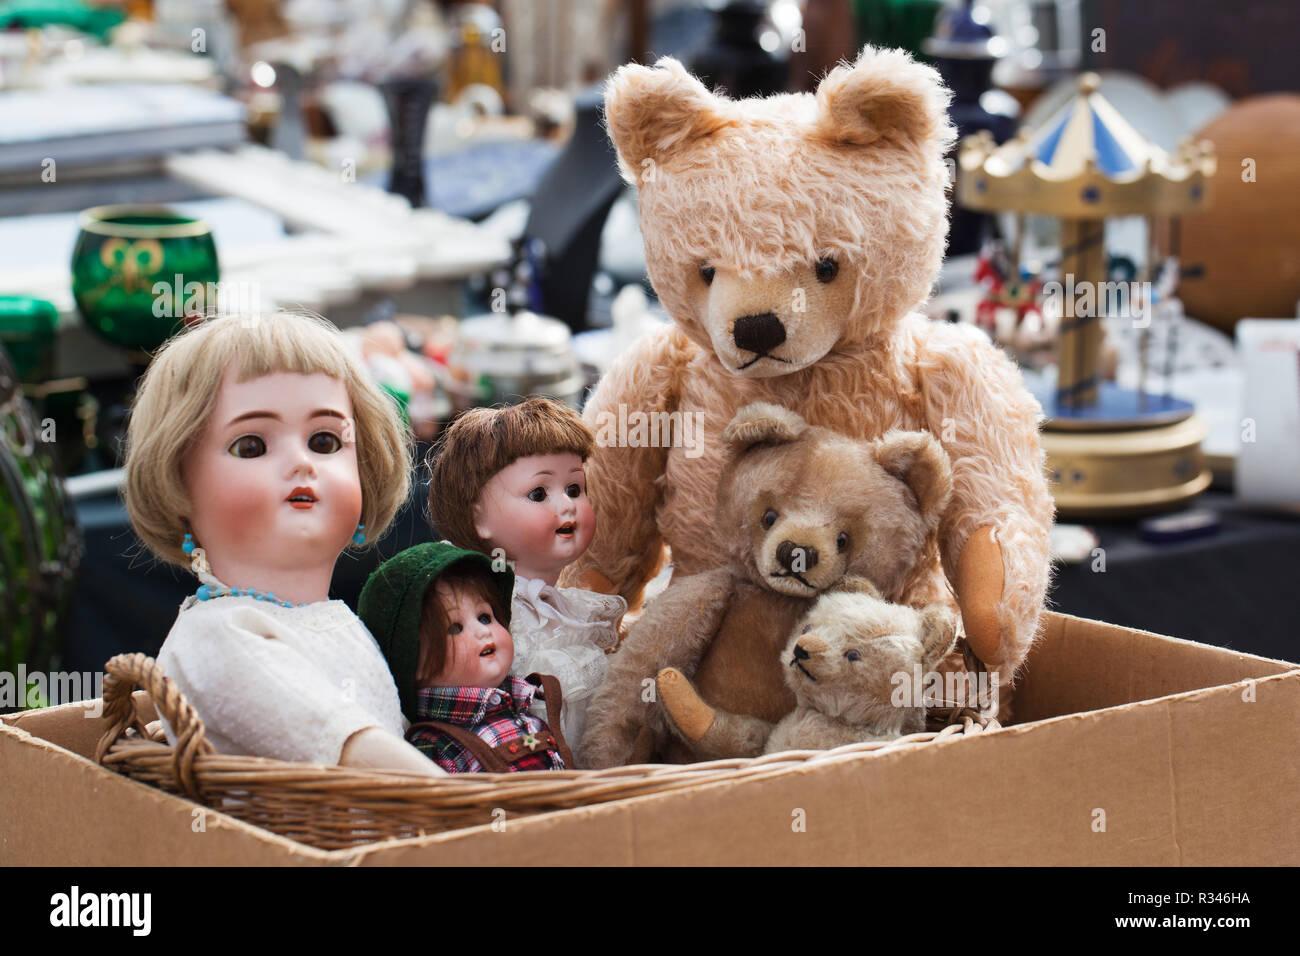 teddy bears and dolls at flea market - Stock Image